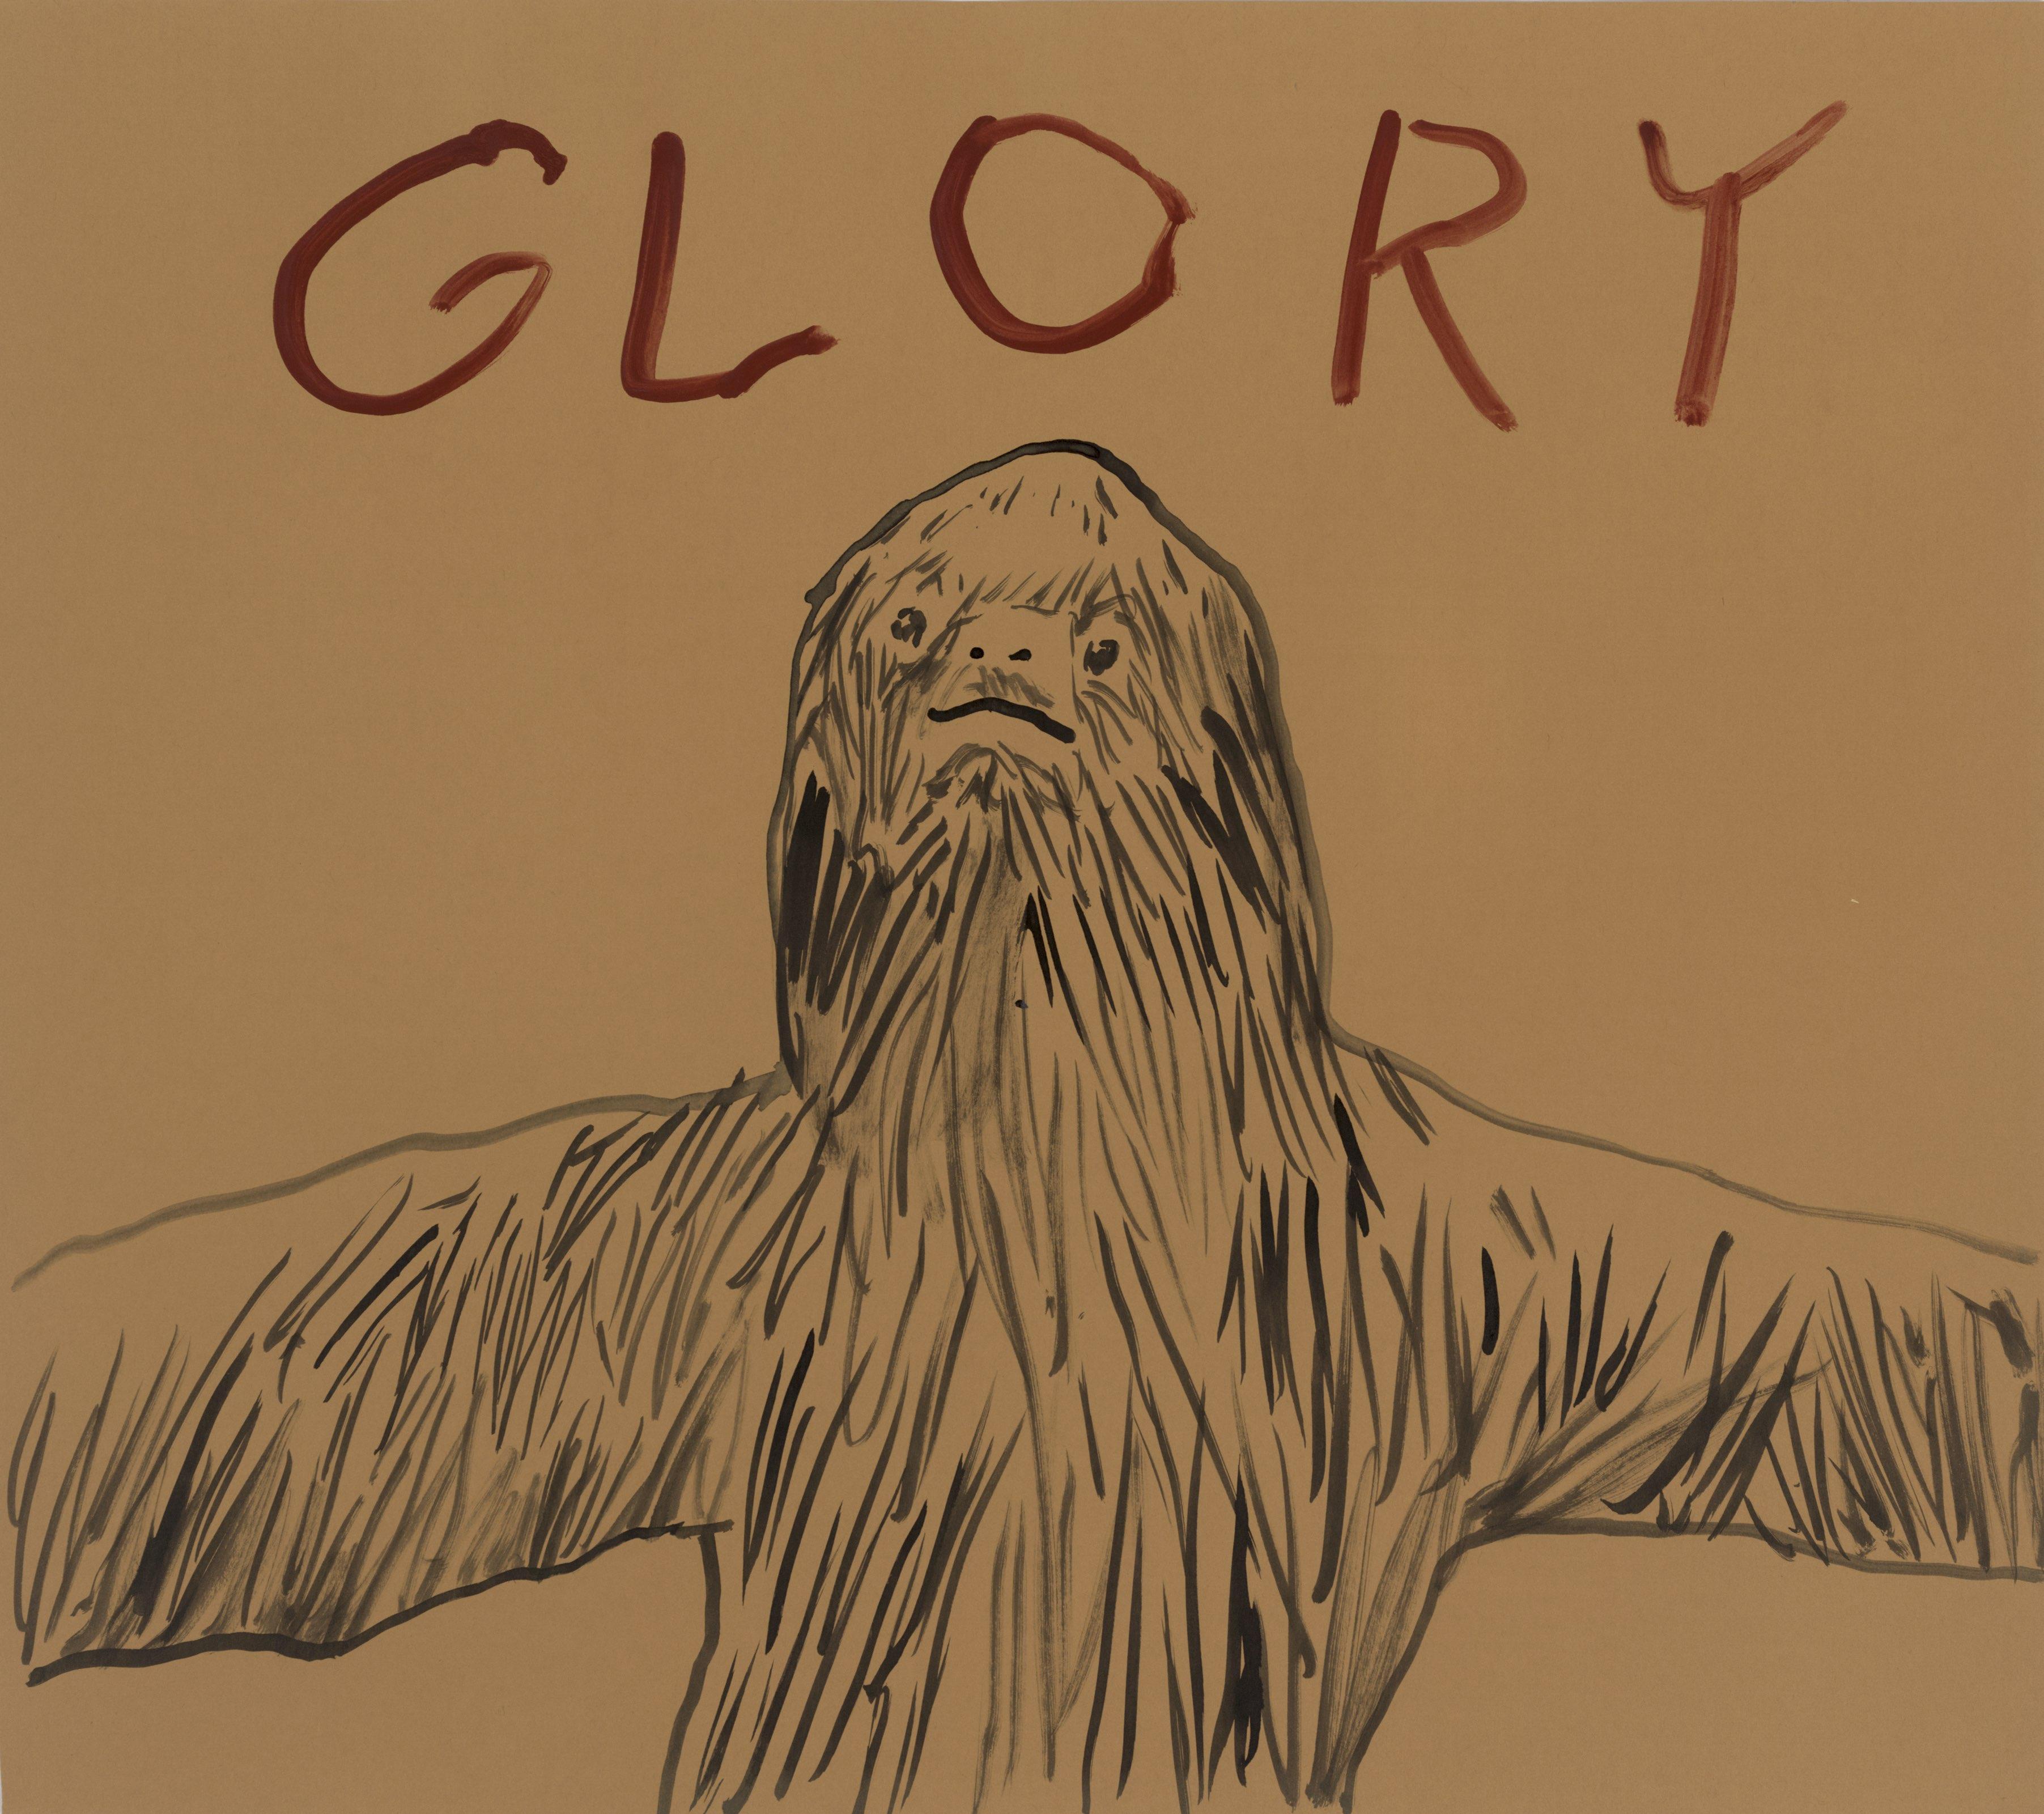 eggers_40 glory_sloth